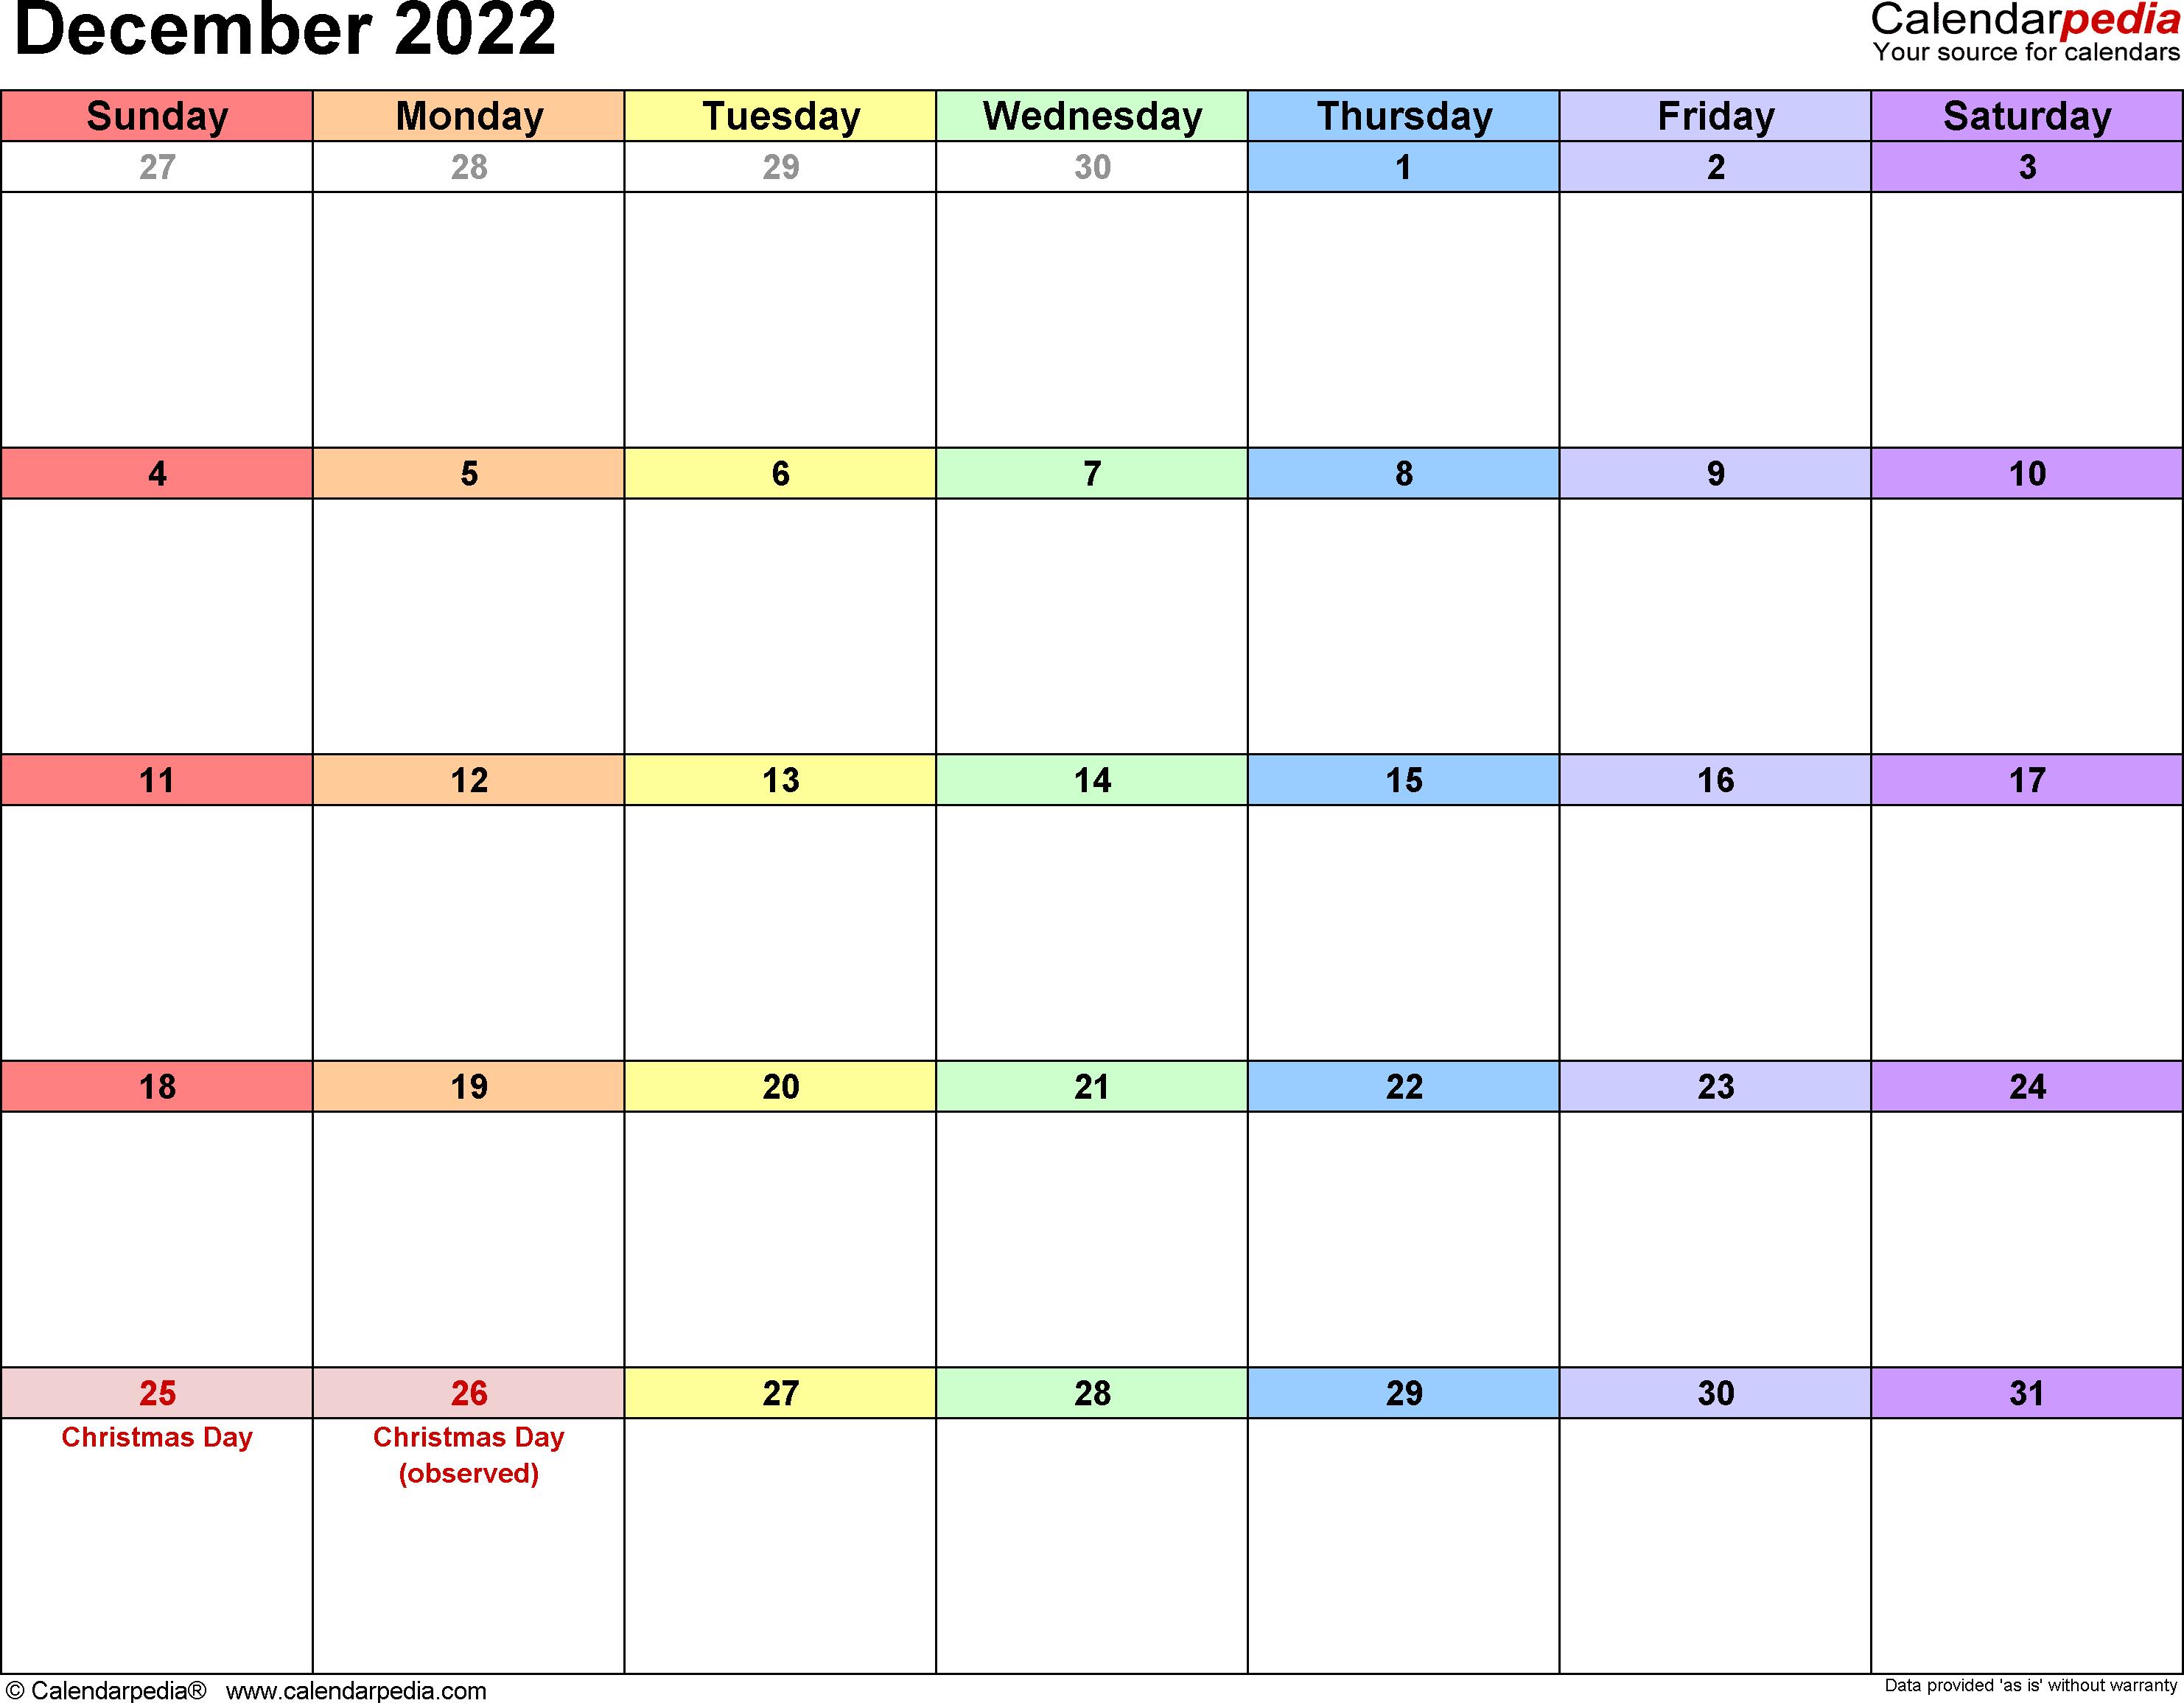 December 2022 calendar printable template